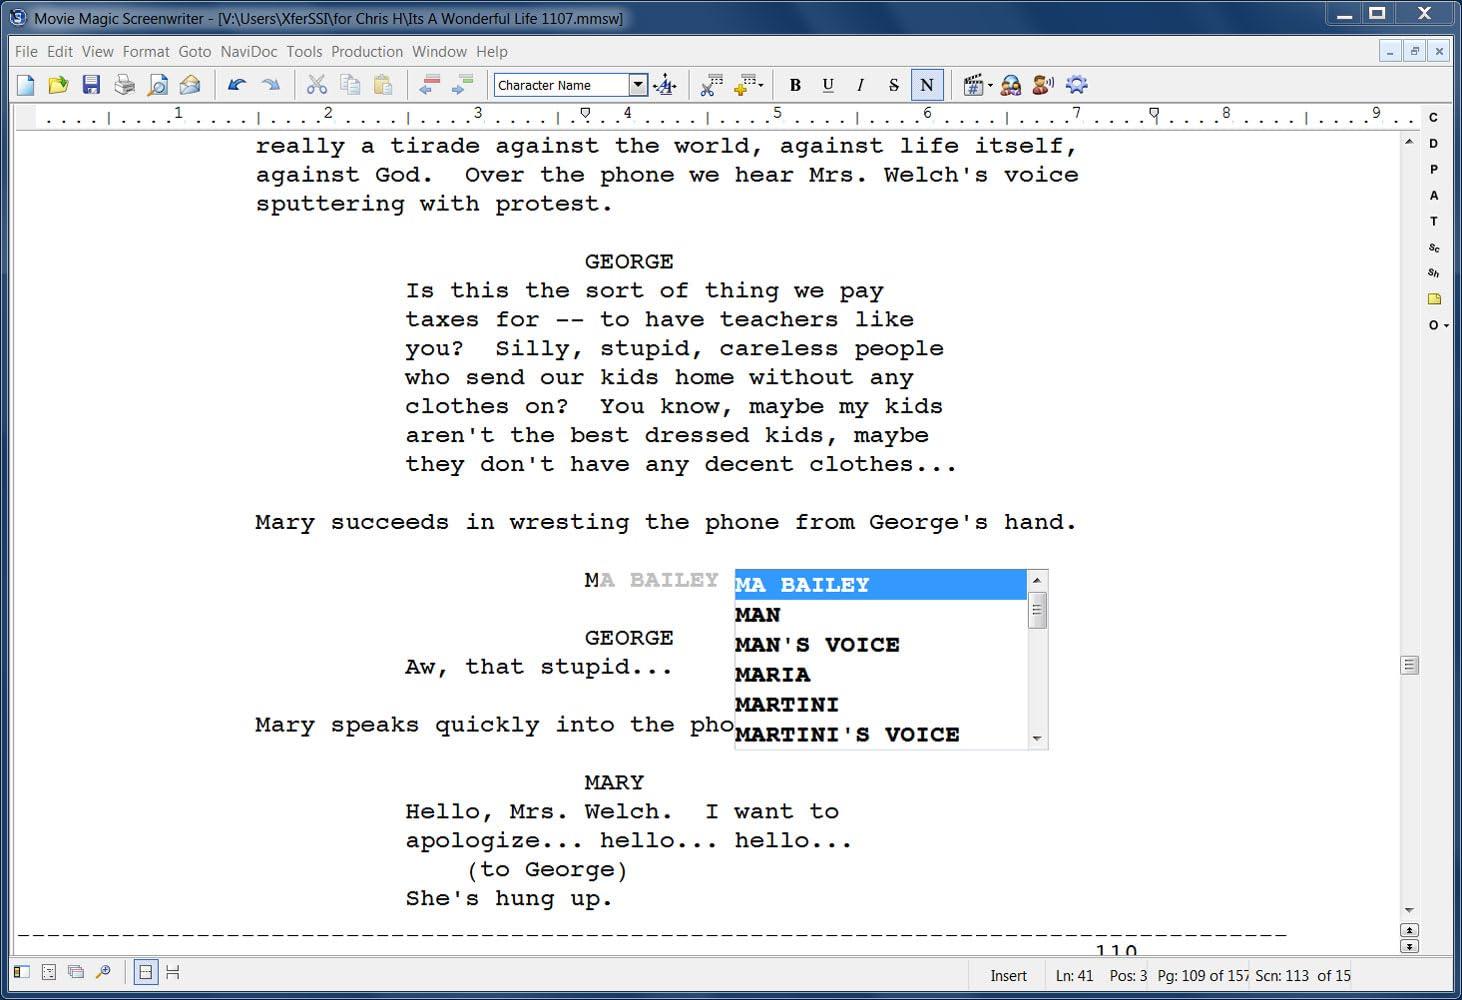 free movie magic screenwriter 6 download full version